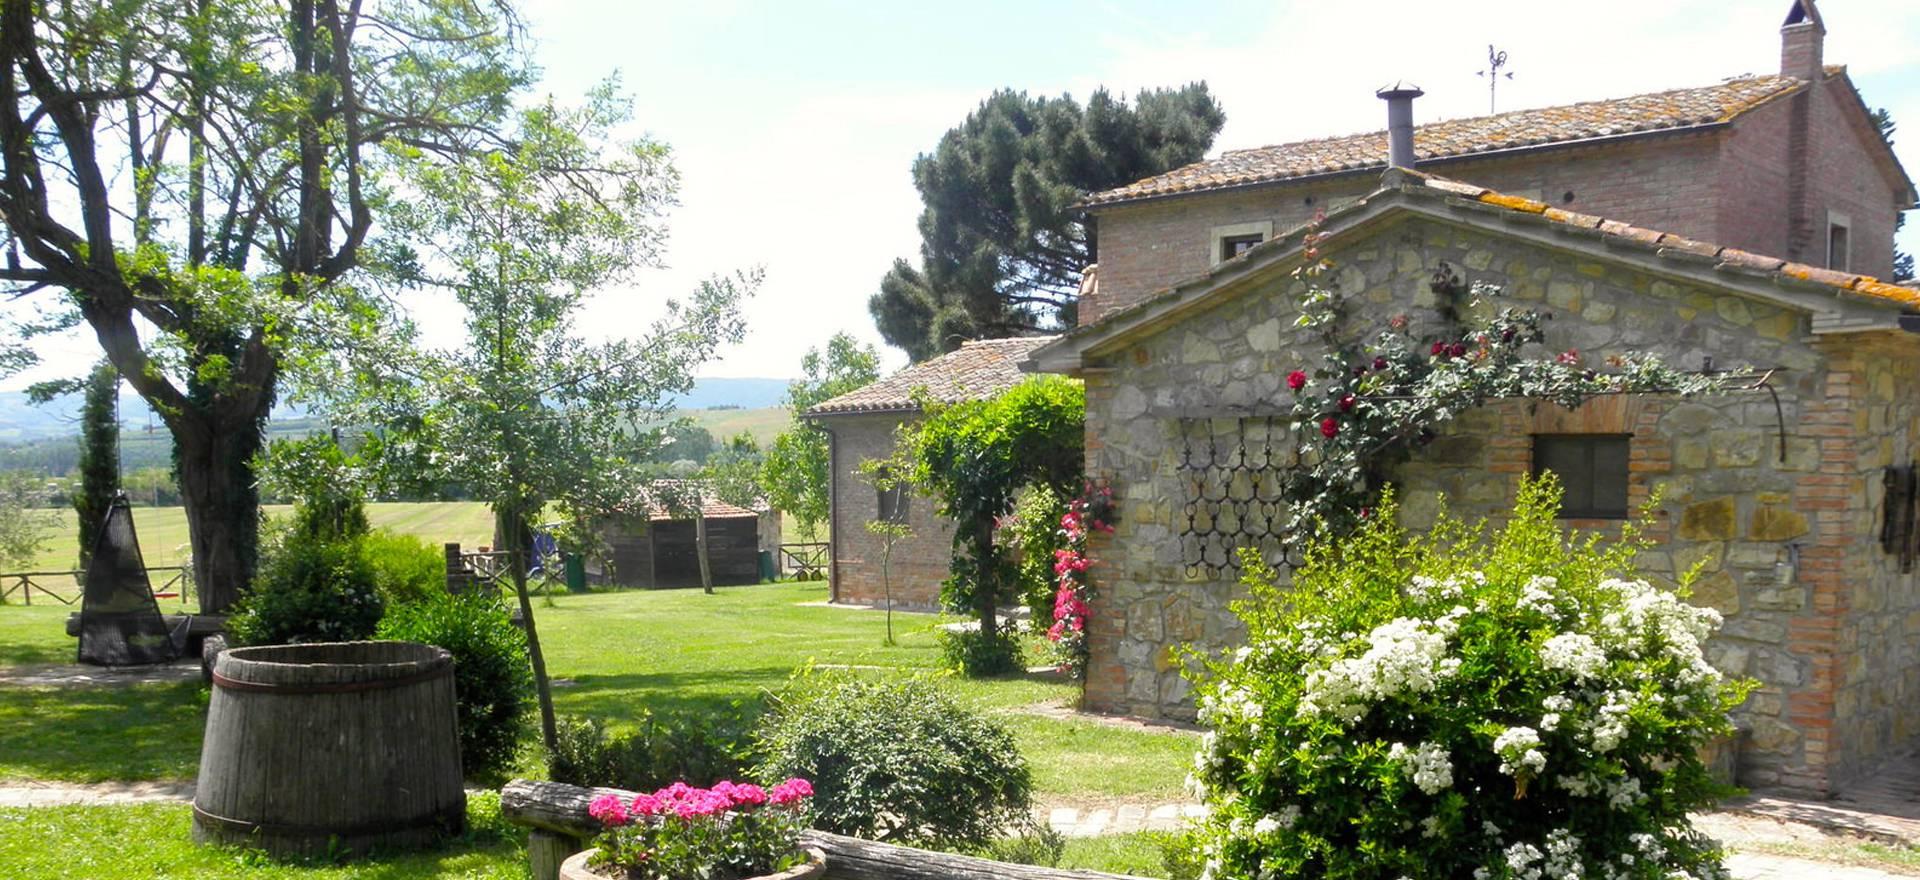 Agriturismo Umbria Agriturismo accogliente e adatto ai bambini in Umbria